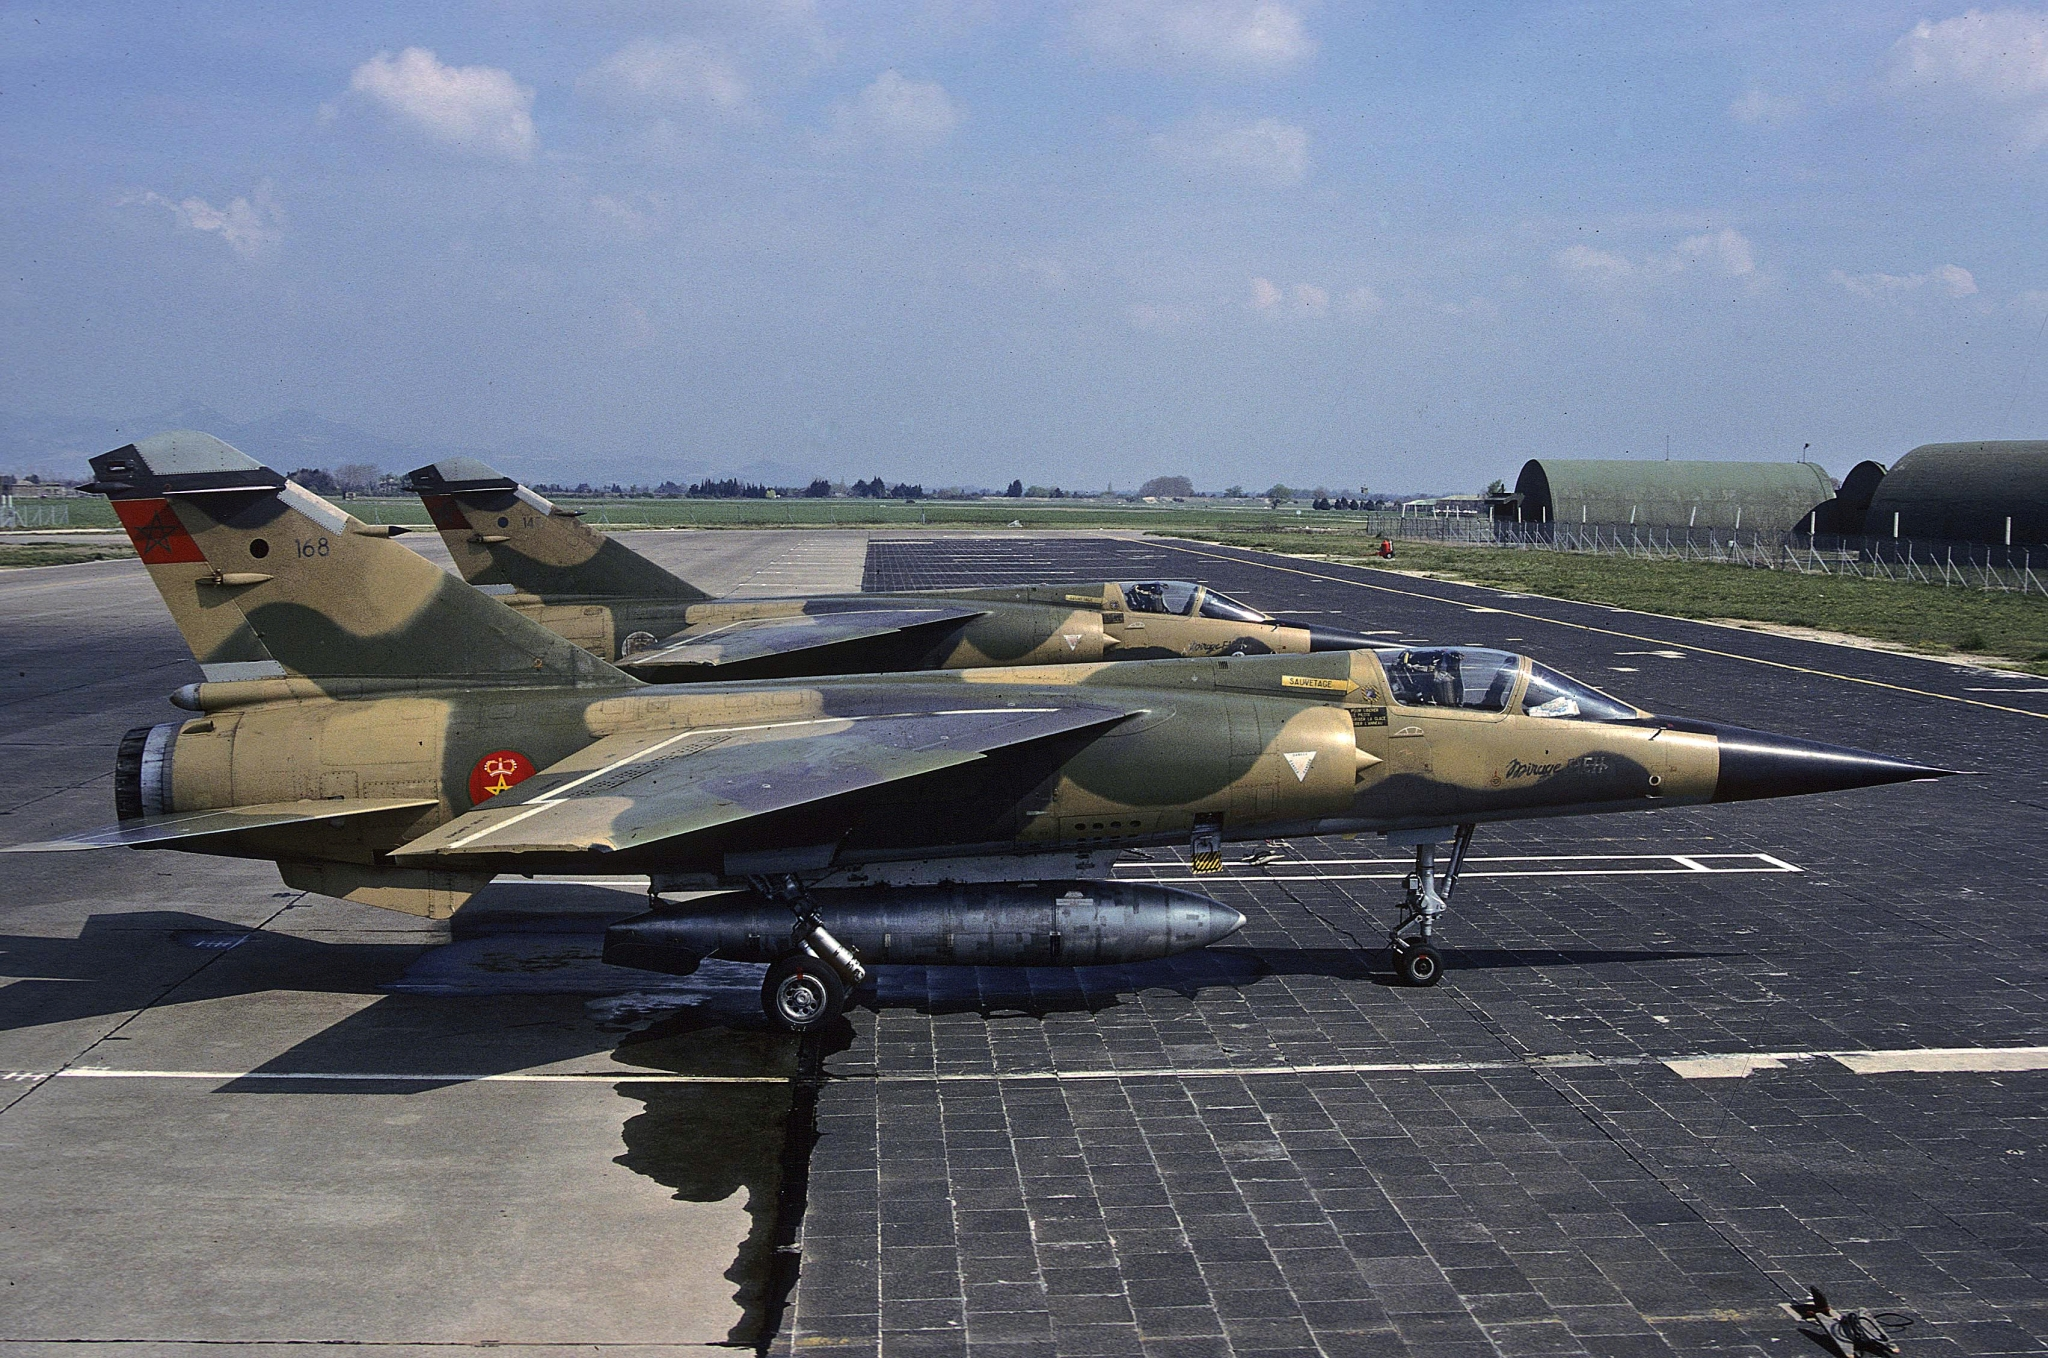 FRA: Photos Mirage F1 - Page 15 45304628245_25b7eb9b4c_o